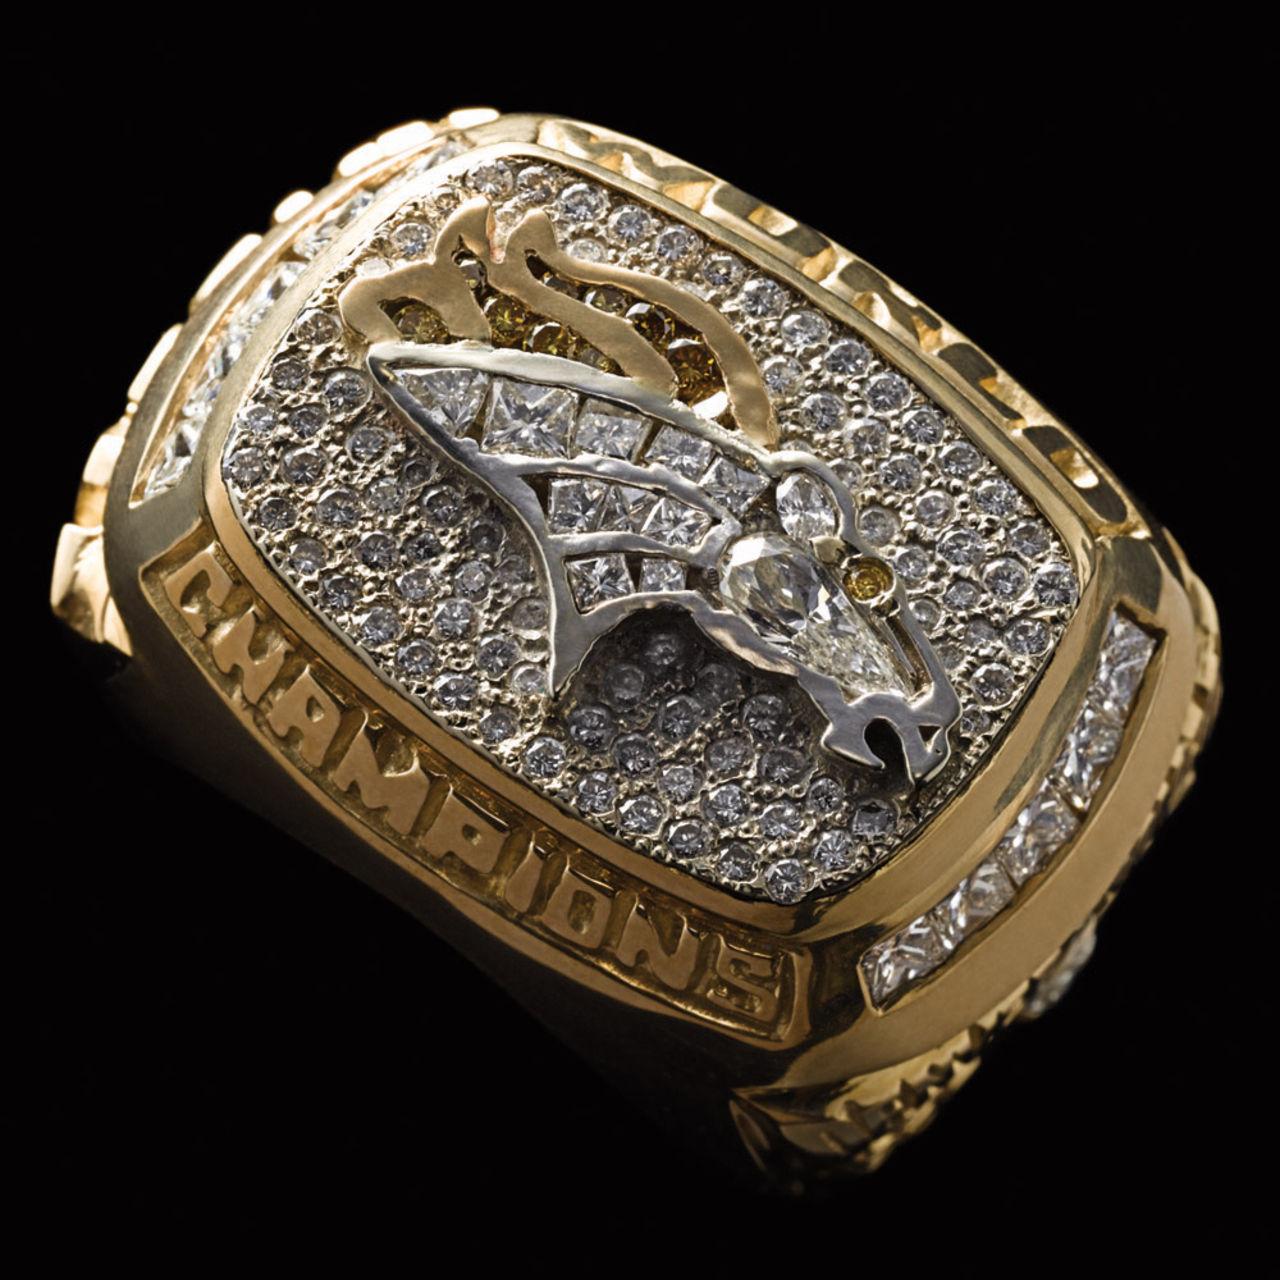 Denver Broncos 1998 champions ring